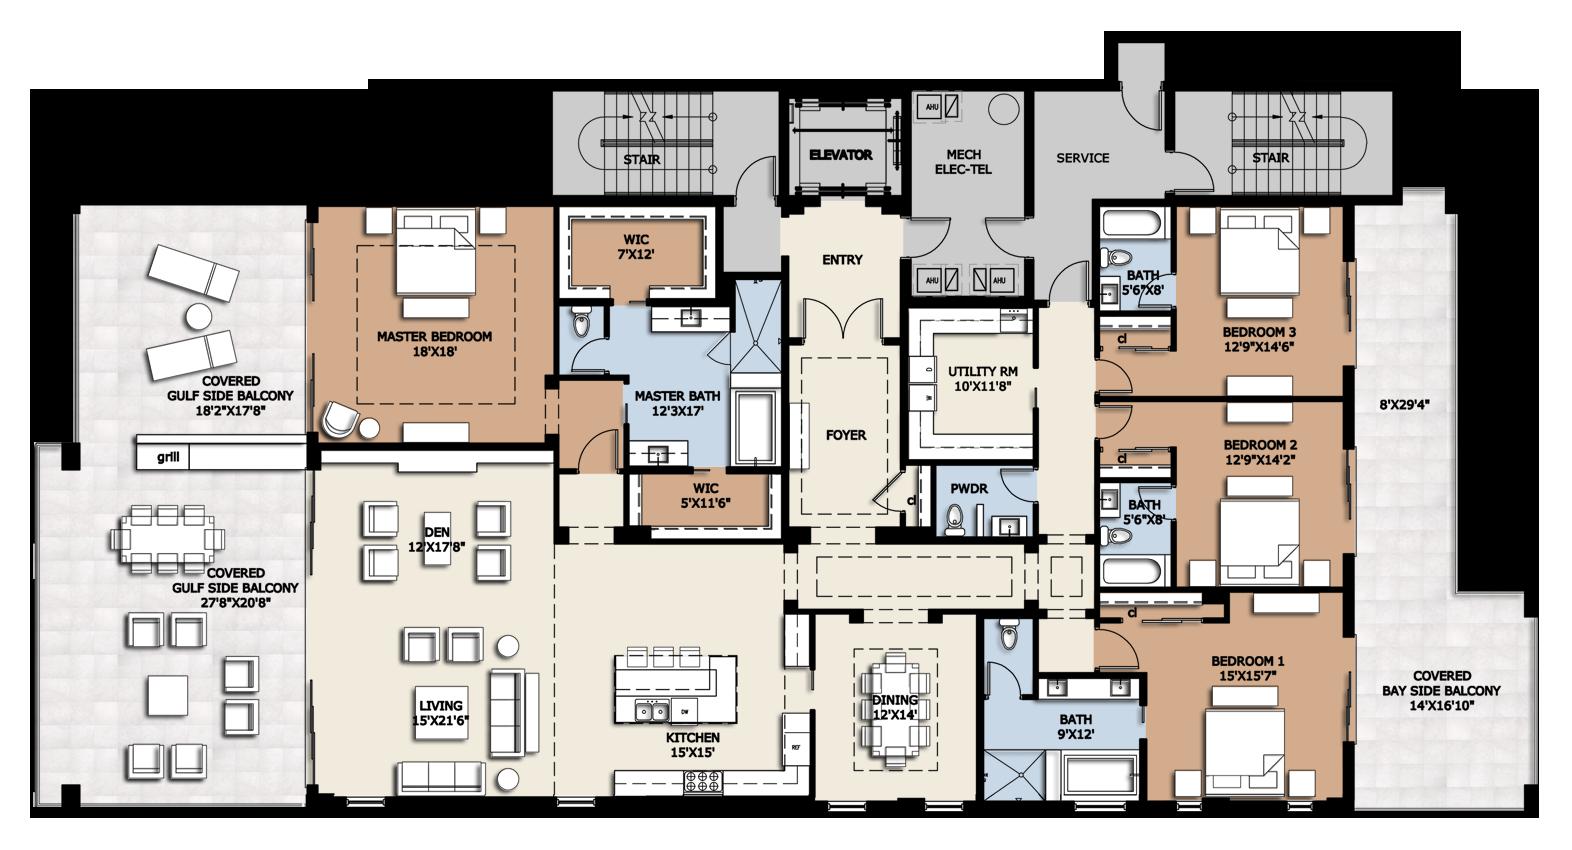 Luxury bedroom apartment plans. Furniture clipart floor plan